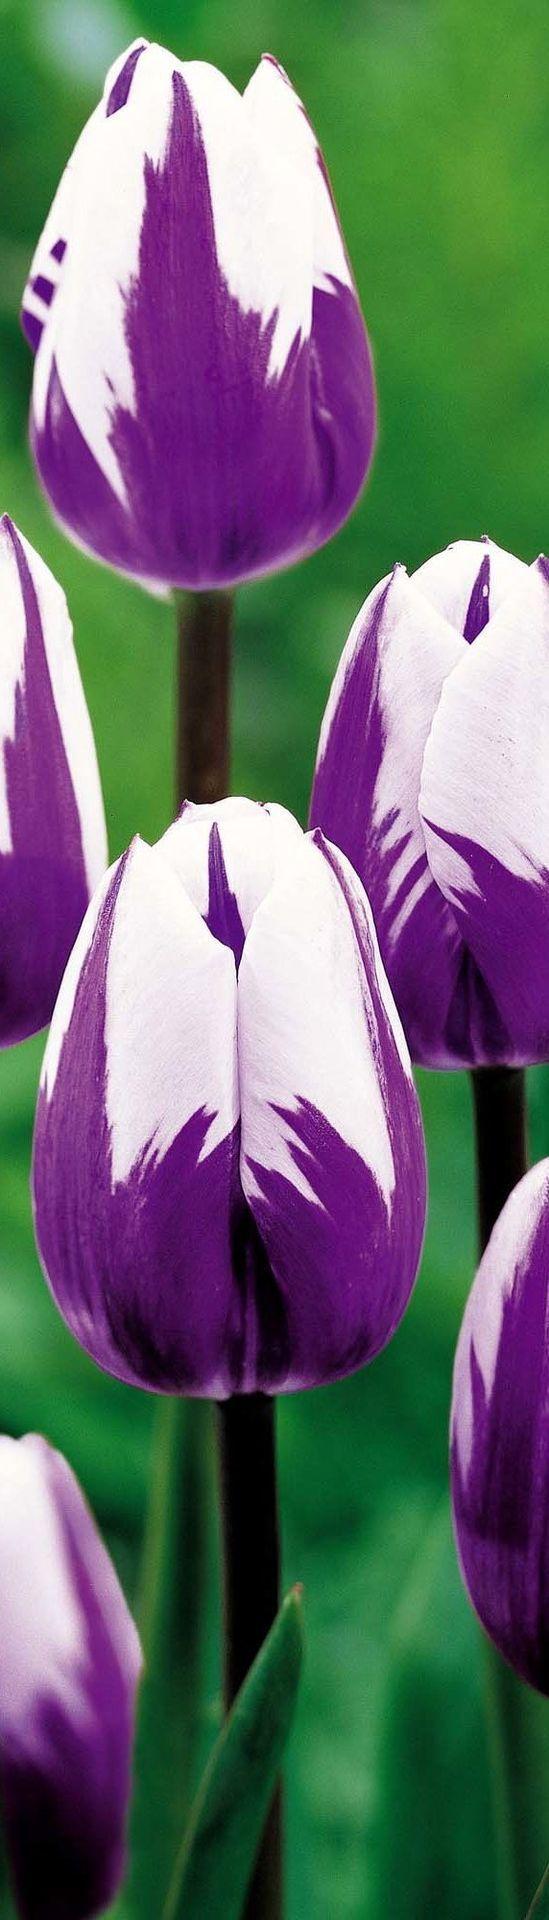 Tulipanes ourpura.